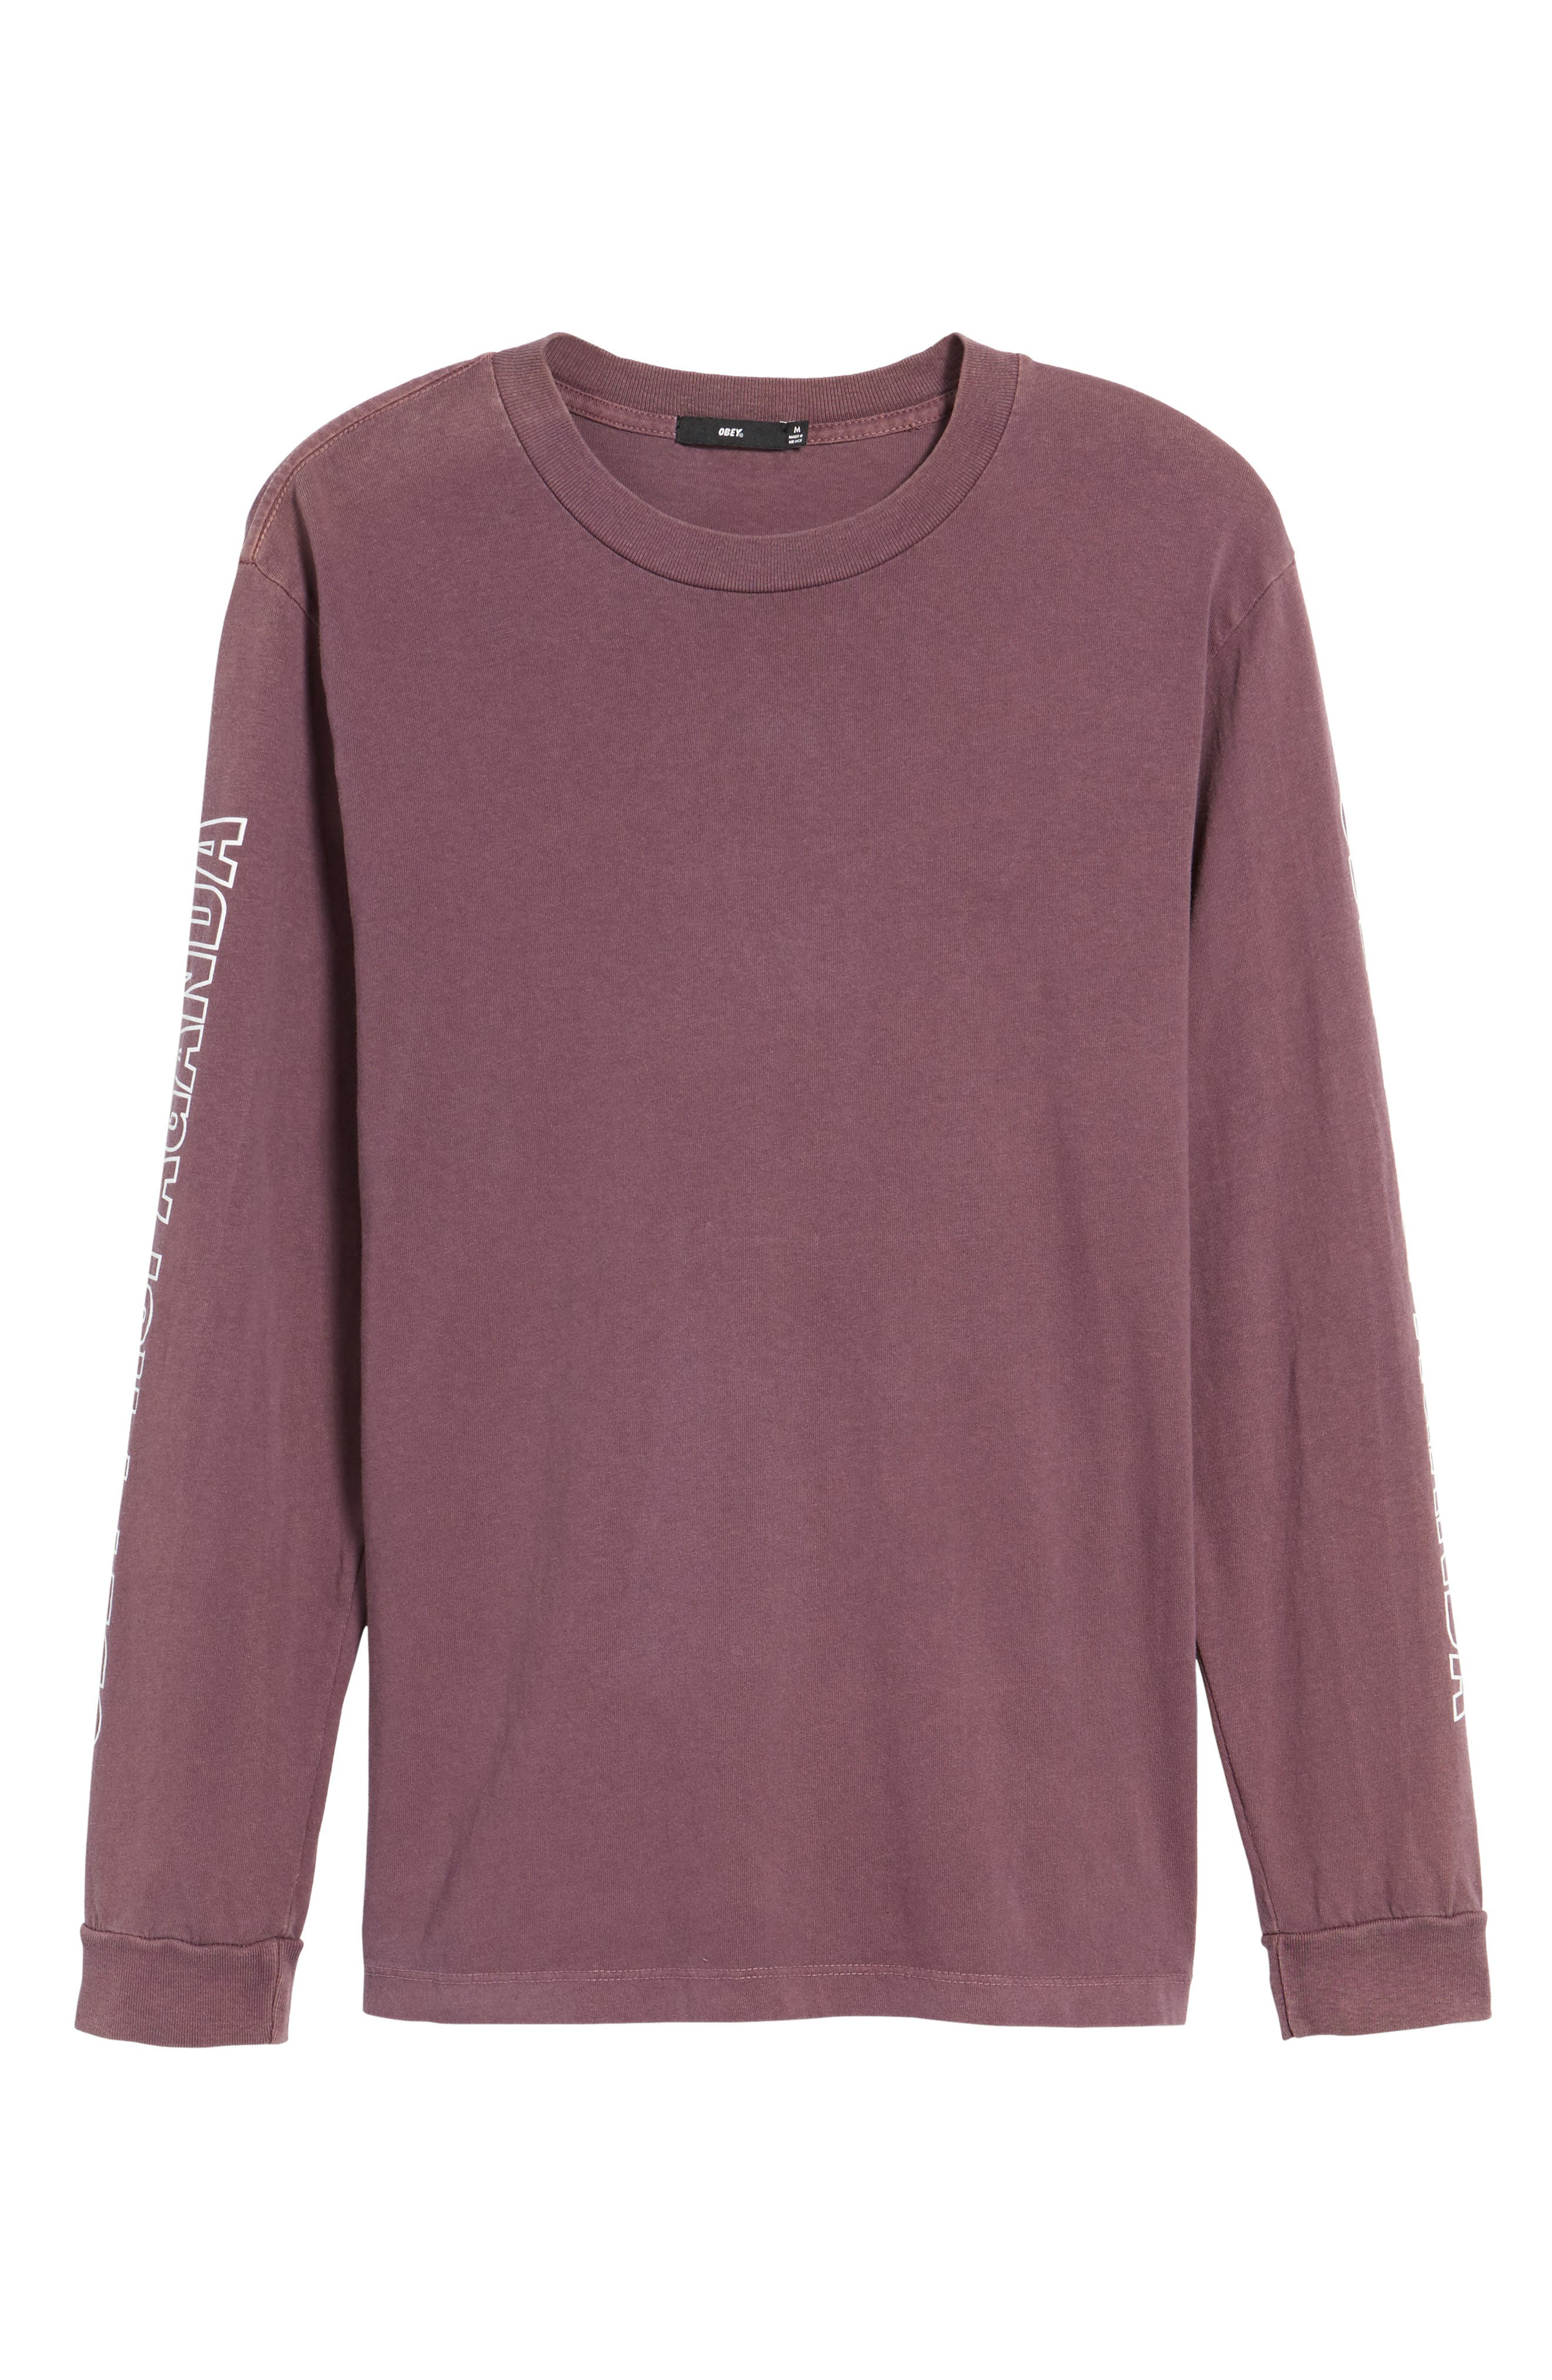 Rough Draft Long Sleeve T-Shirt,                             Alternate thumbnail 6, color,                             503